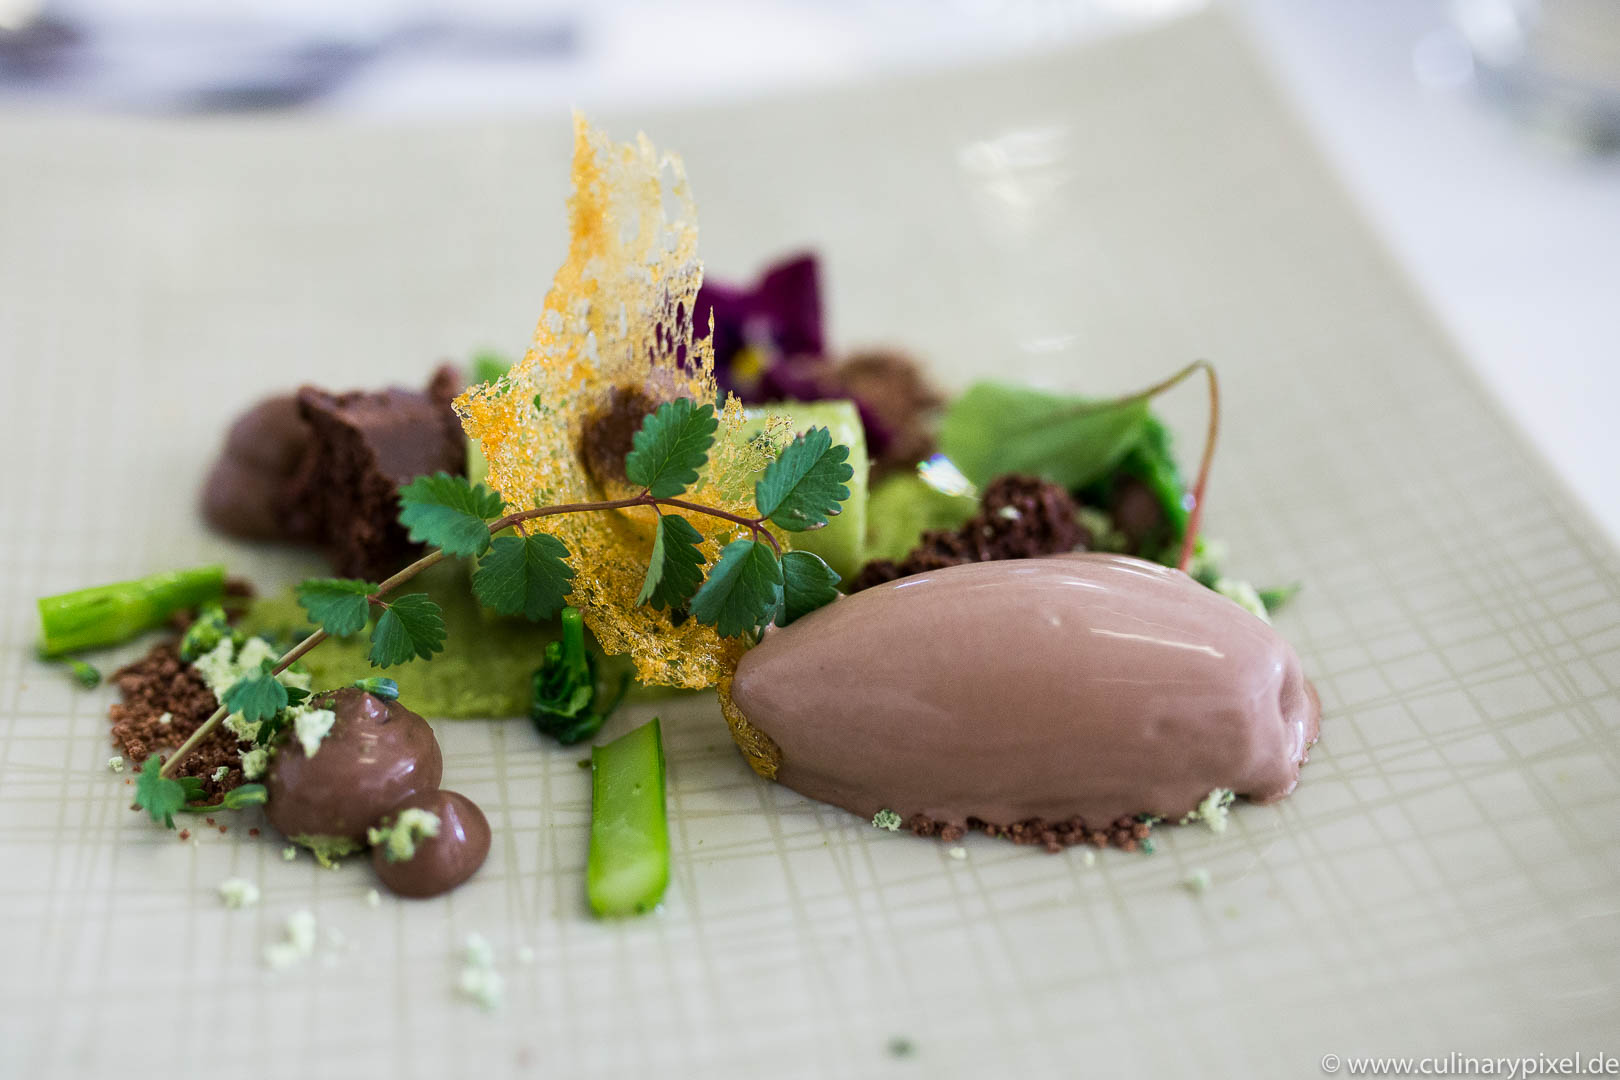 Keltenhof Wilder Broccoli & Original Beans Schokolade Alexander Huber Jeunes Restaurateurs Genusslabor V und Gründung Genussnetz